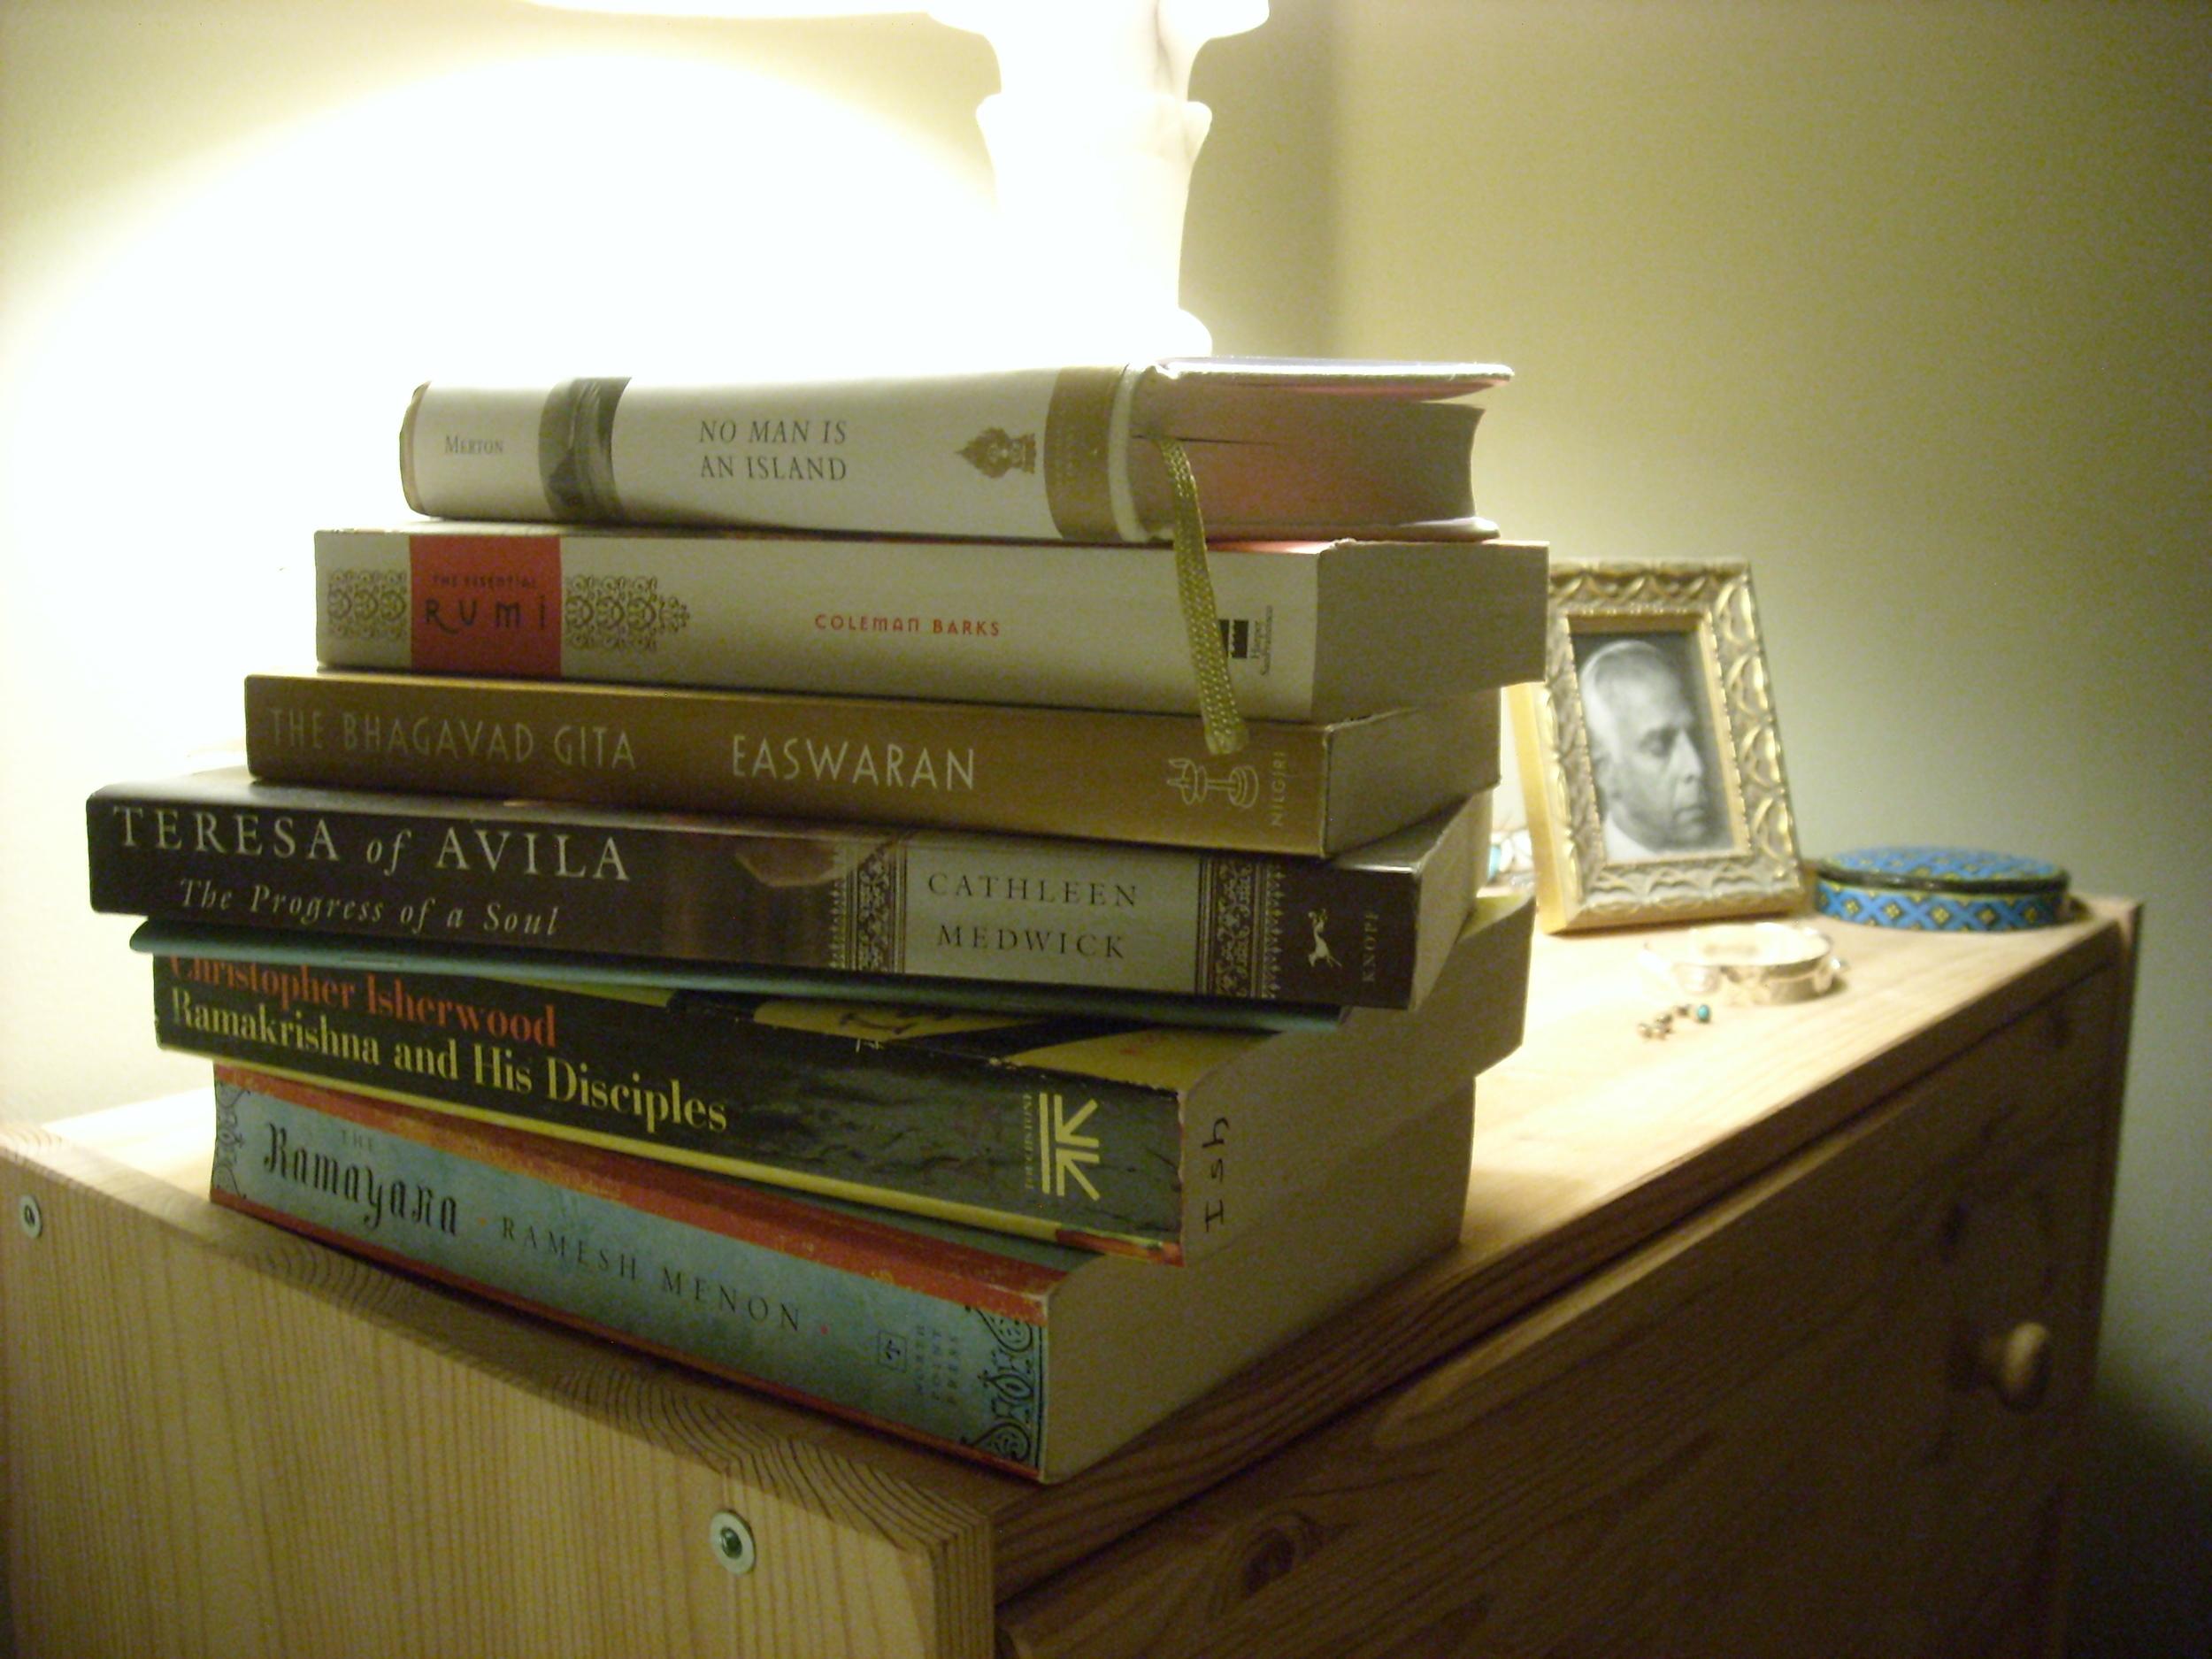 Kate's bedside books.